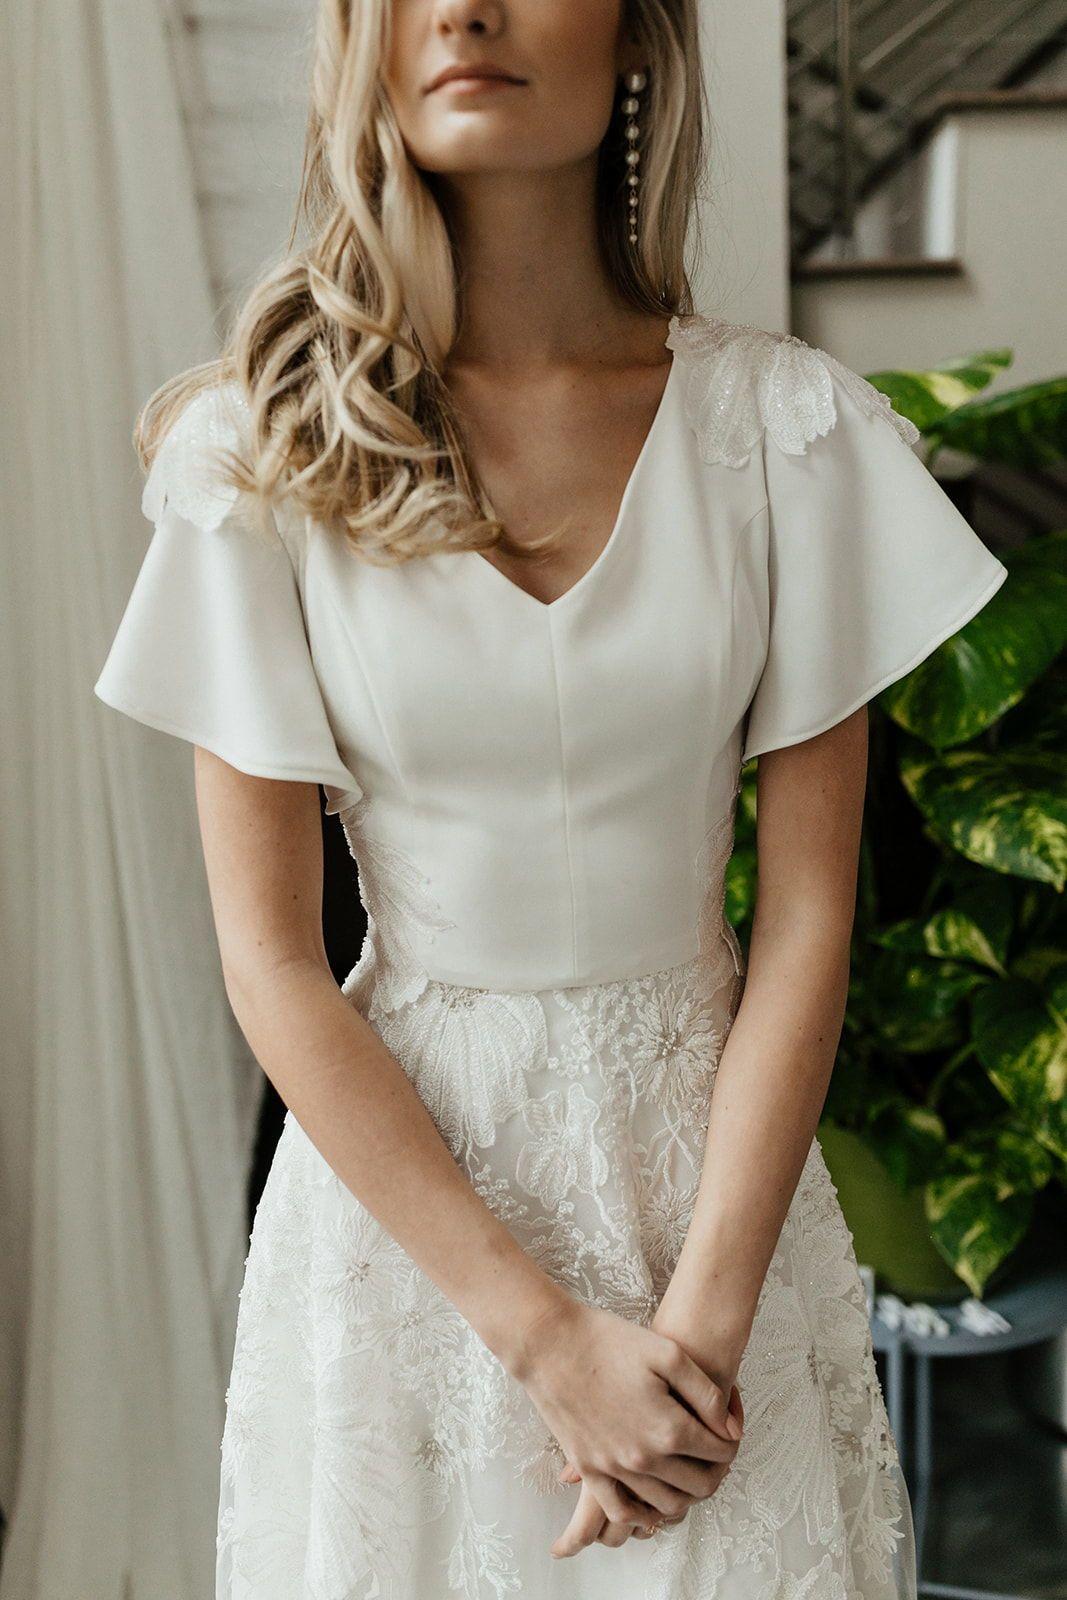 Modest Wedding Dresses That Are As Stylish As You Alta Moda Bridal In 2020 Minimal Wedding Dress Wedding Dresses Wedding Dress Flowy